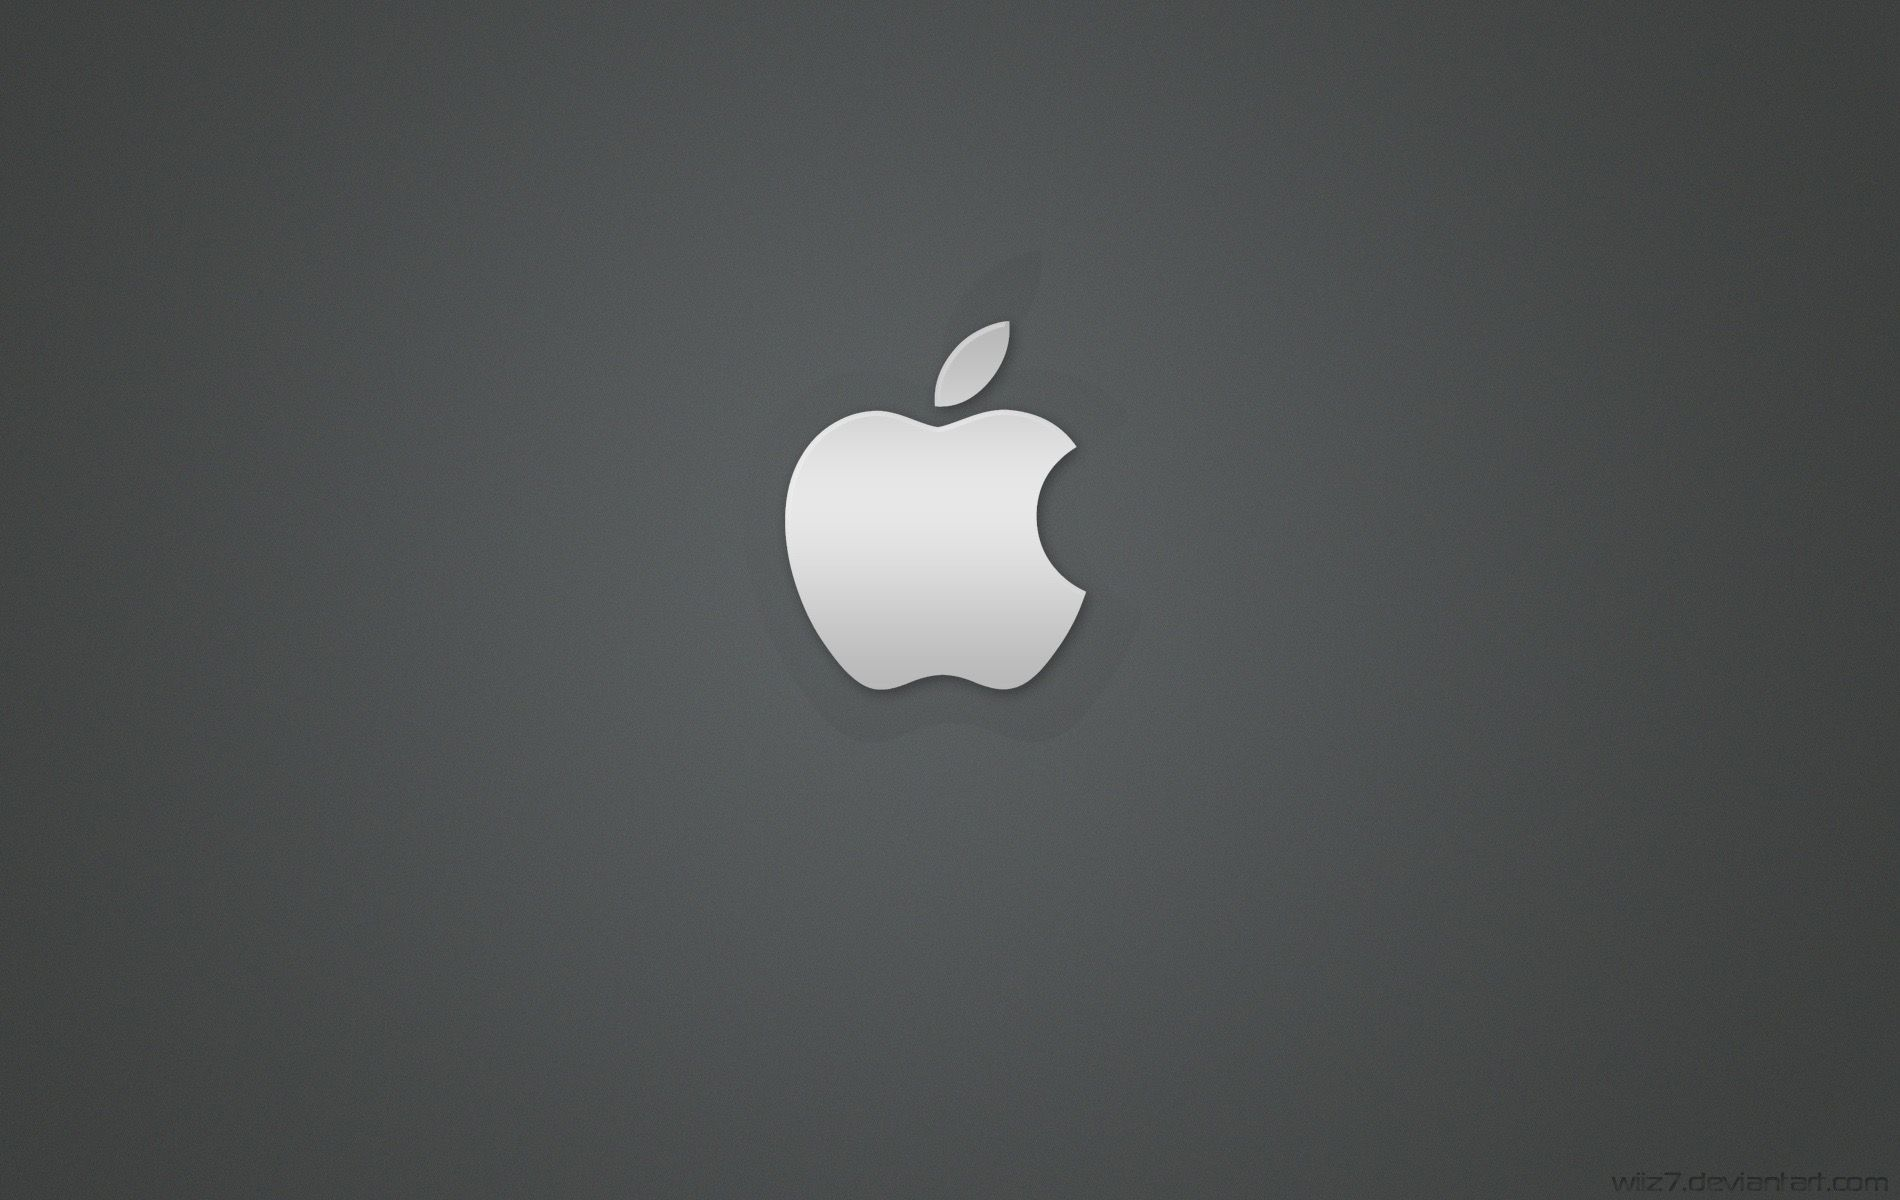 Pin by Ariel Hyers on Normal Random Apple logo